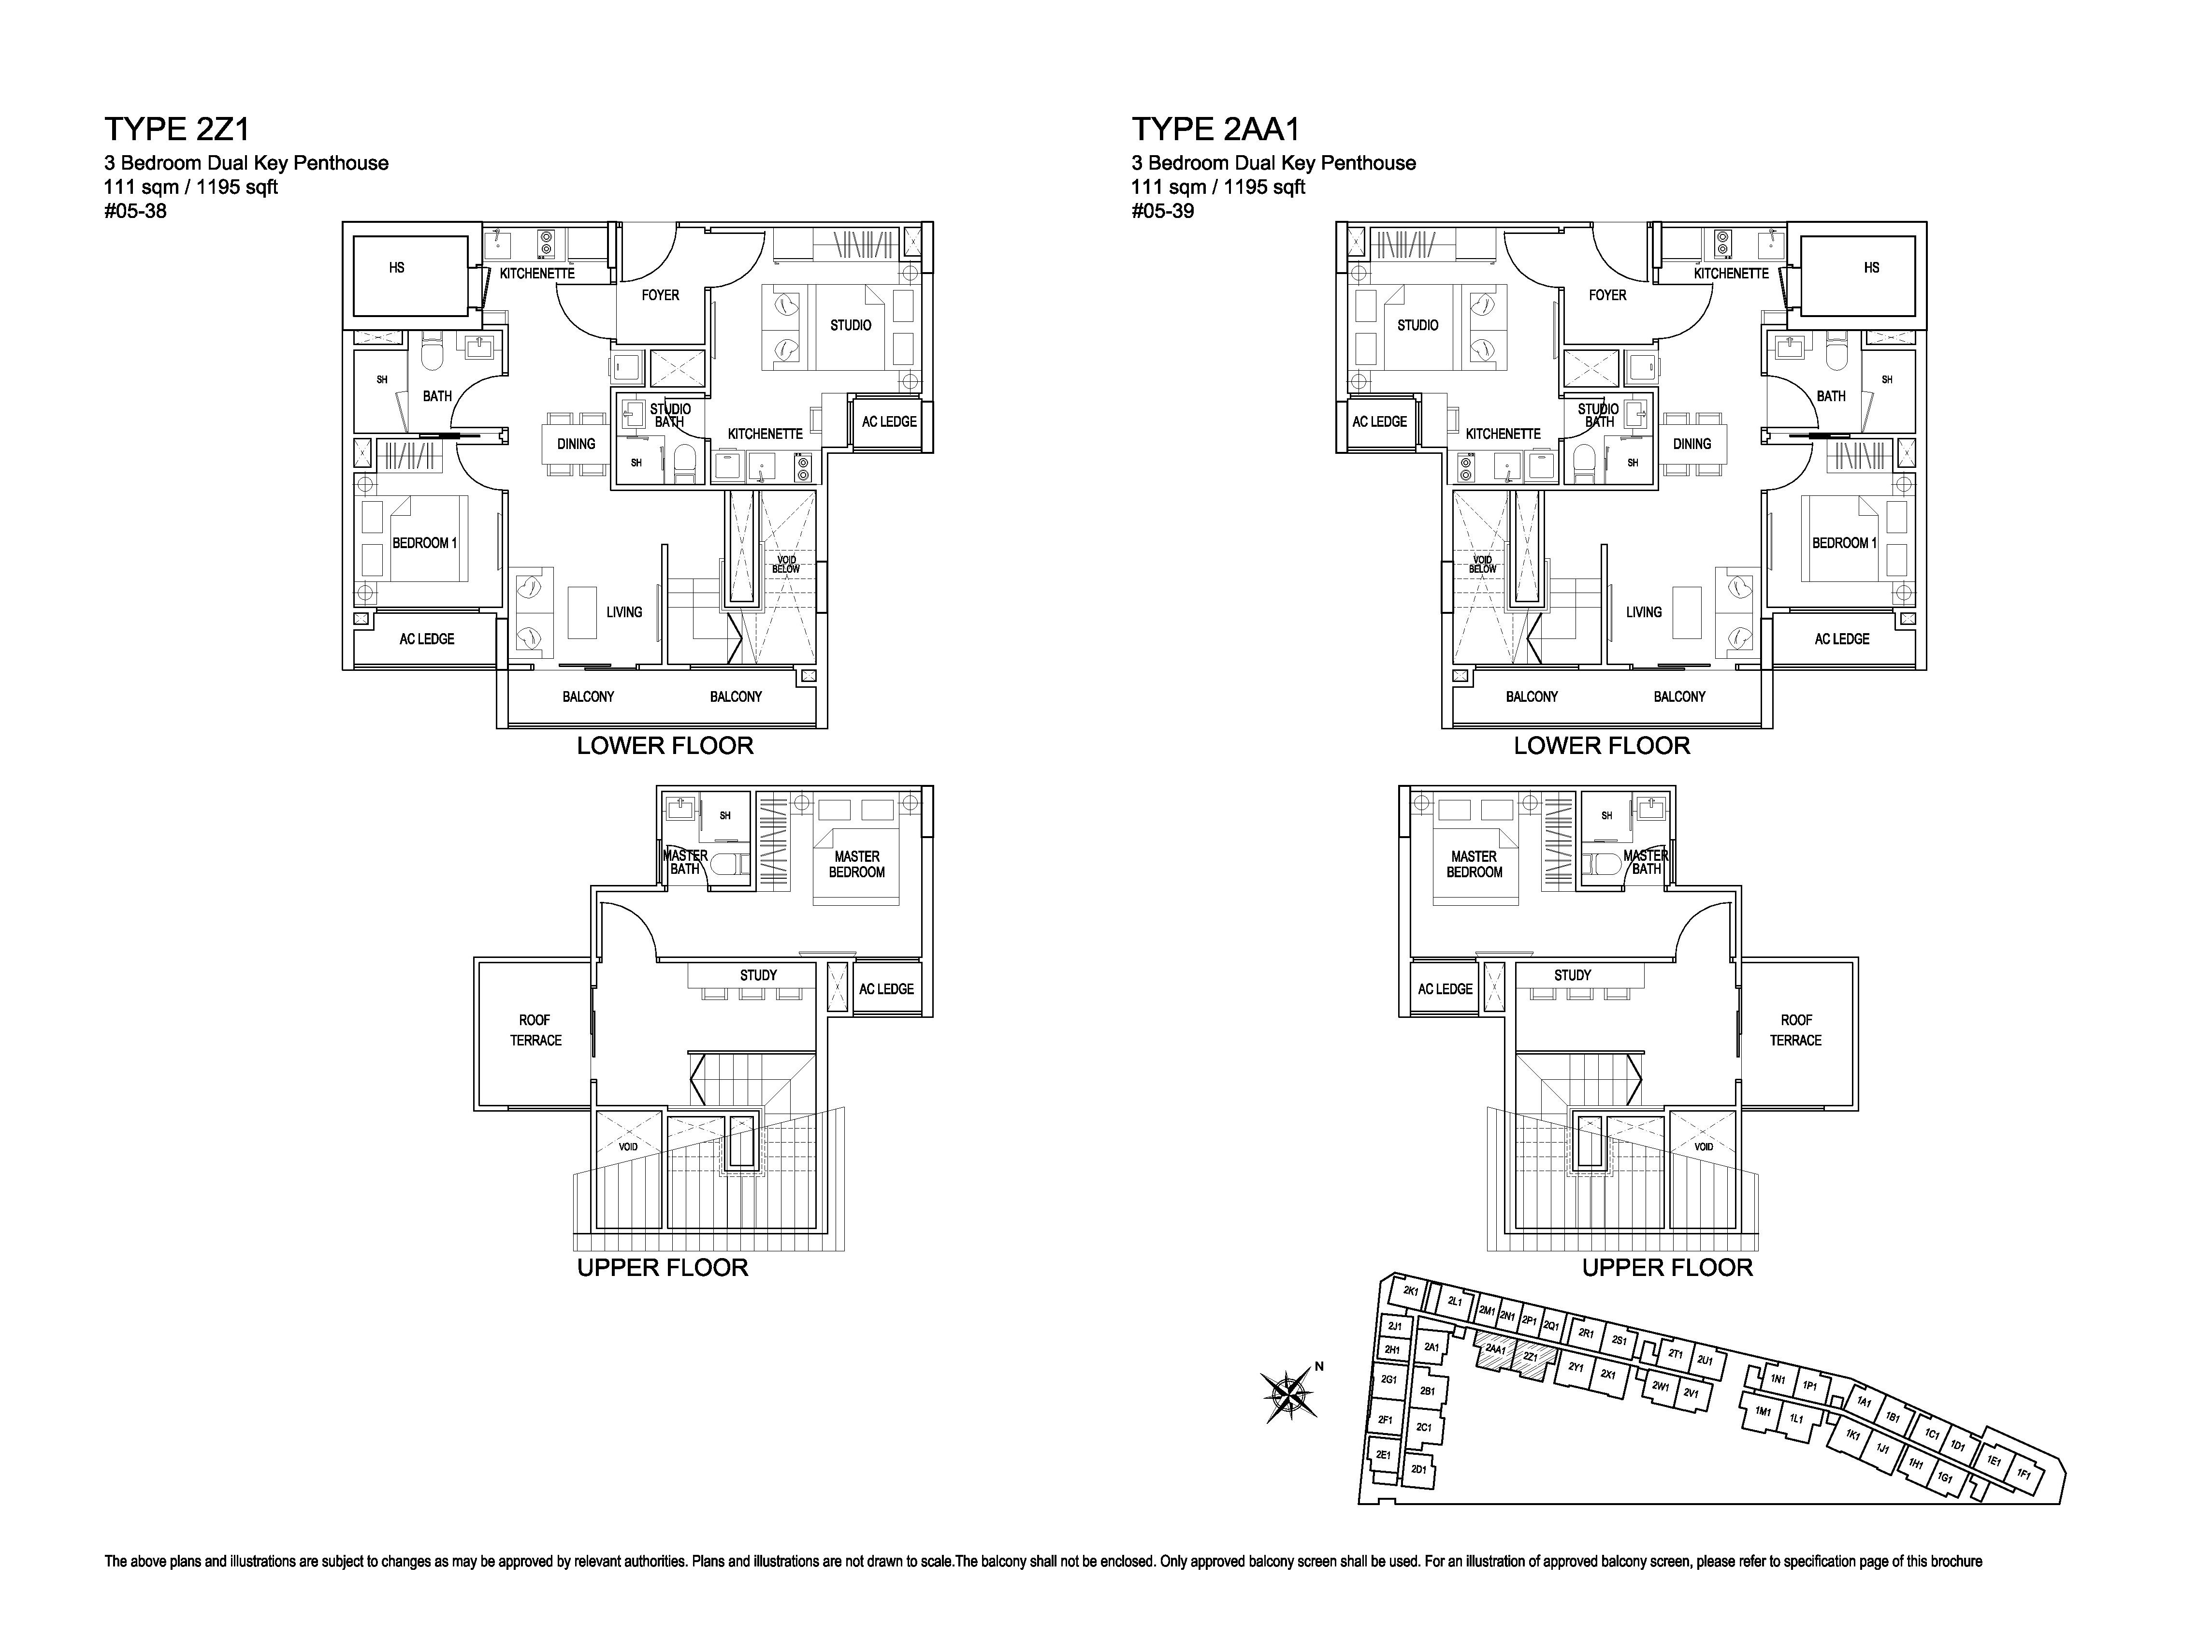 Kensington Square 3 Bedroom Dual Key Penthouse Floor Plans Type 2Z1, 2AA1